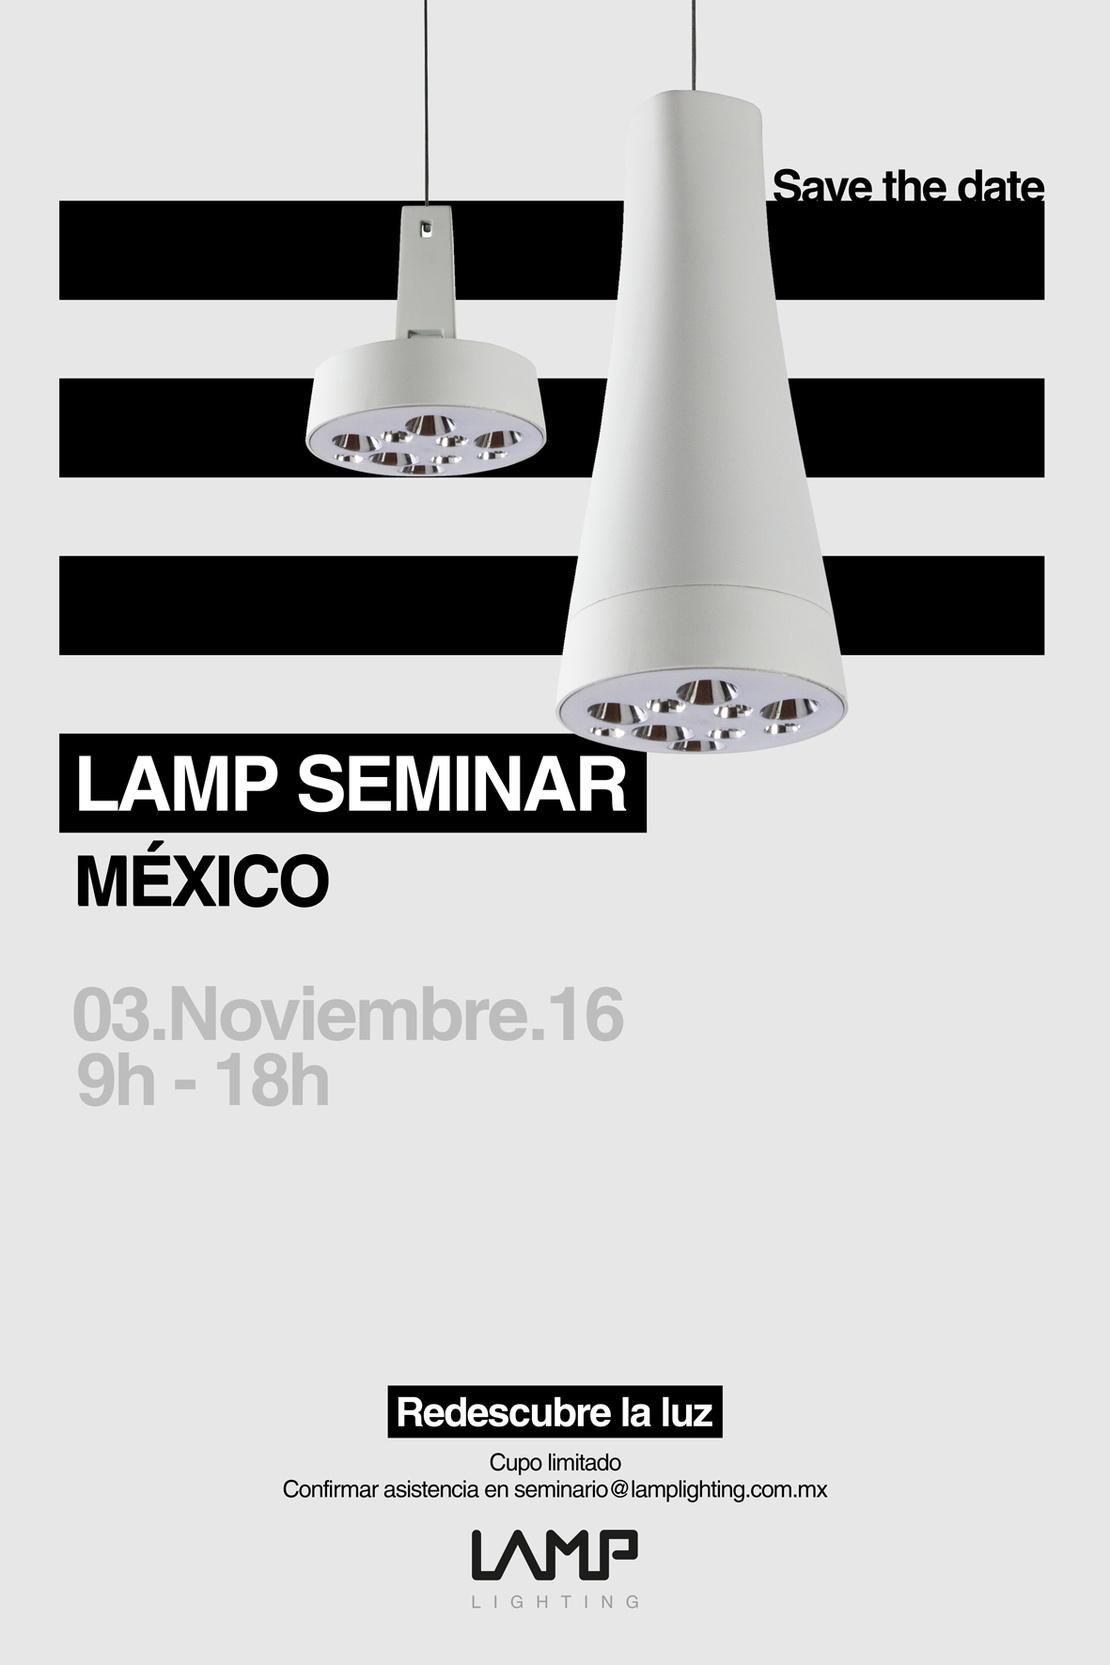 lamp seminar mexico 02